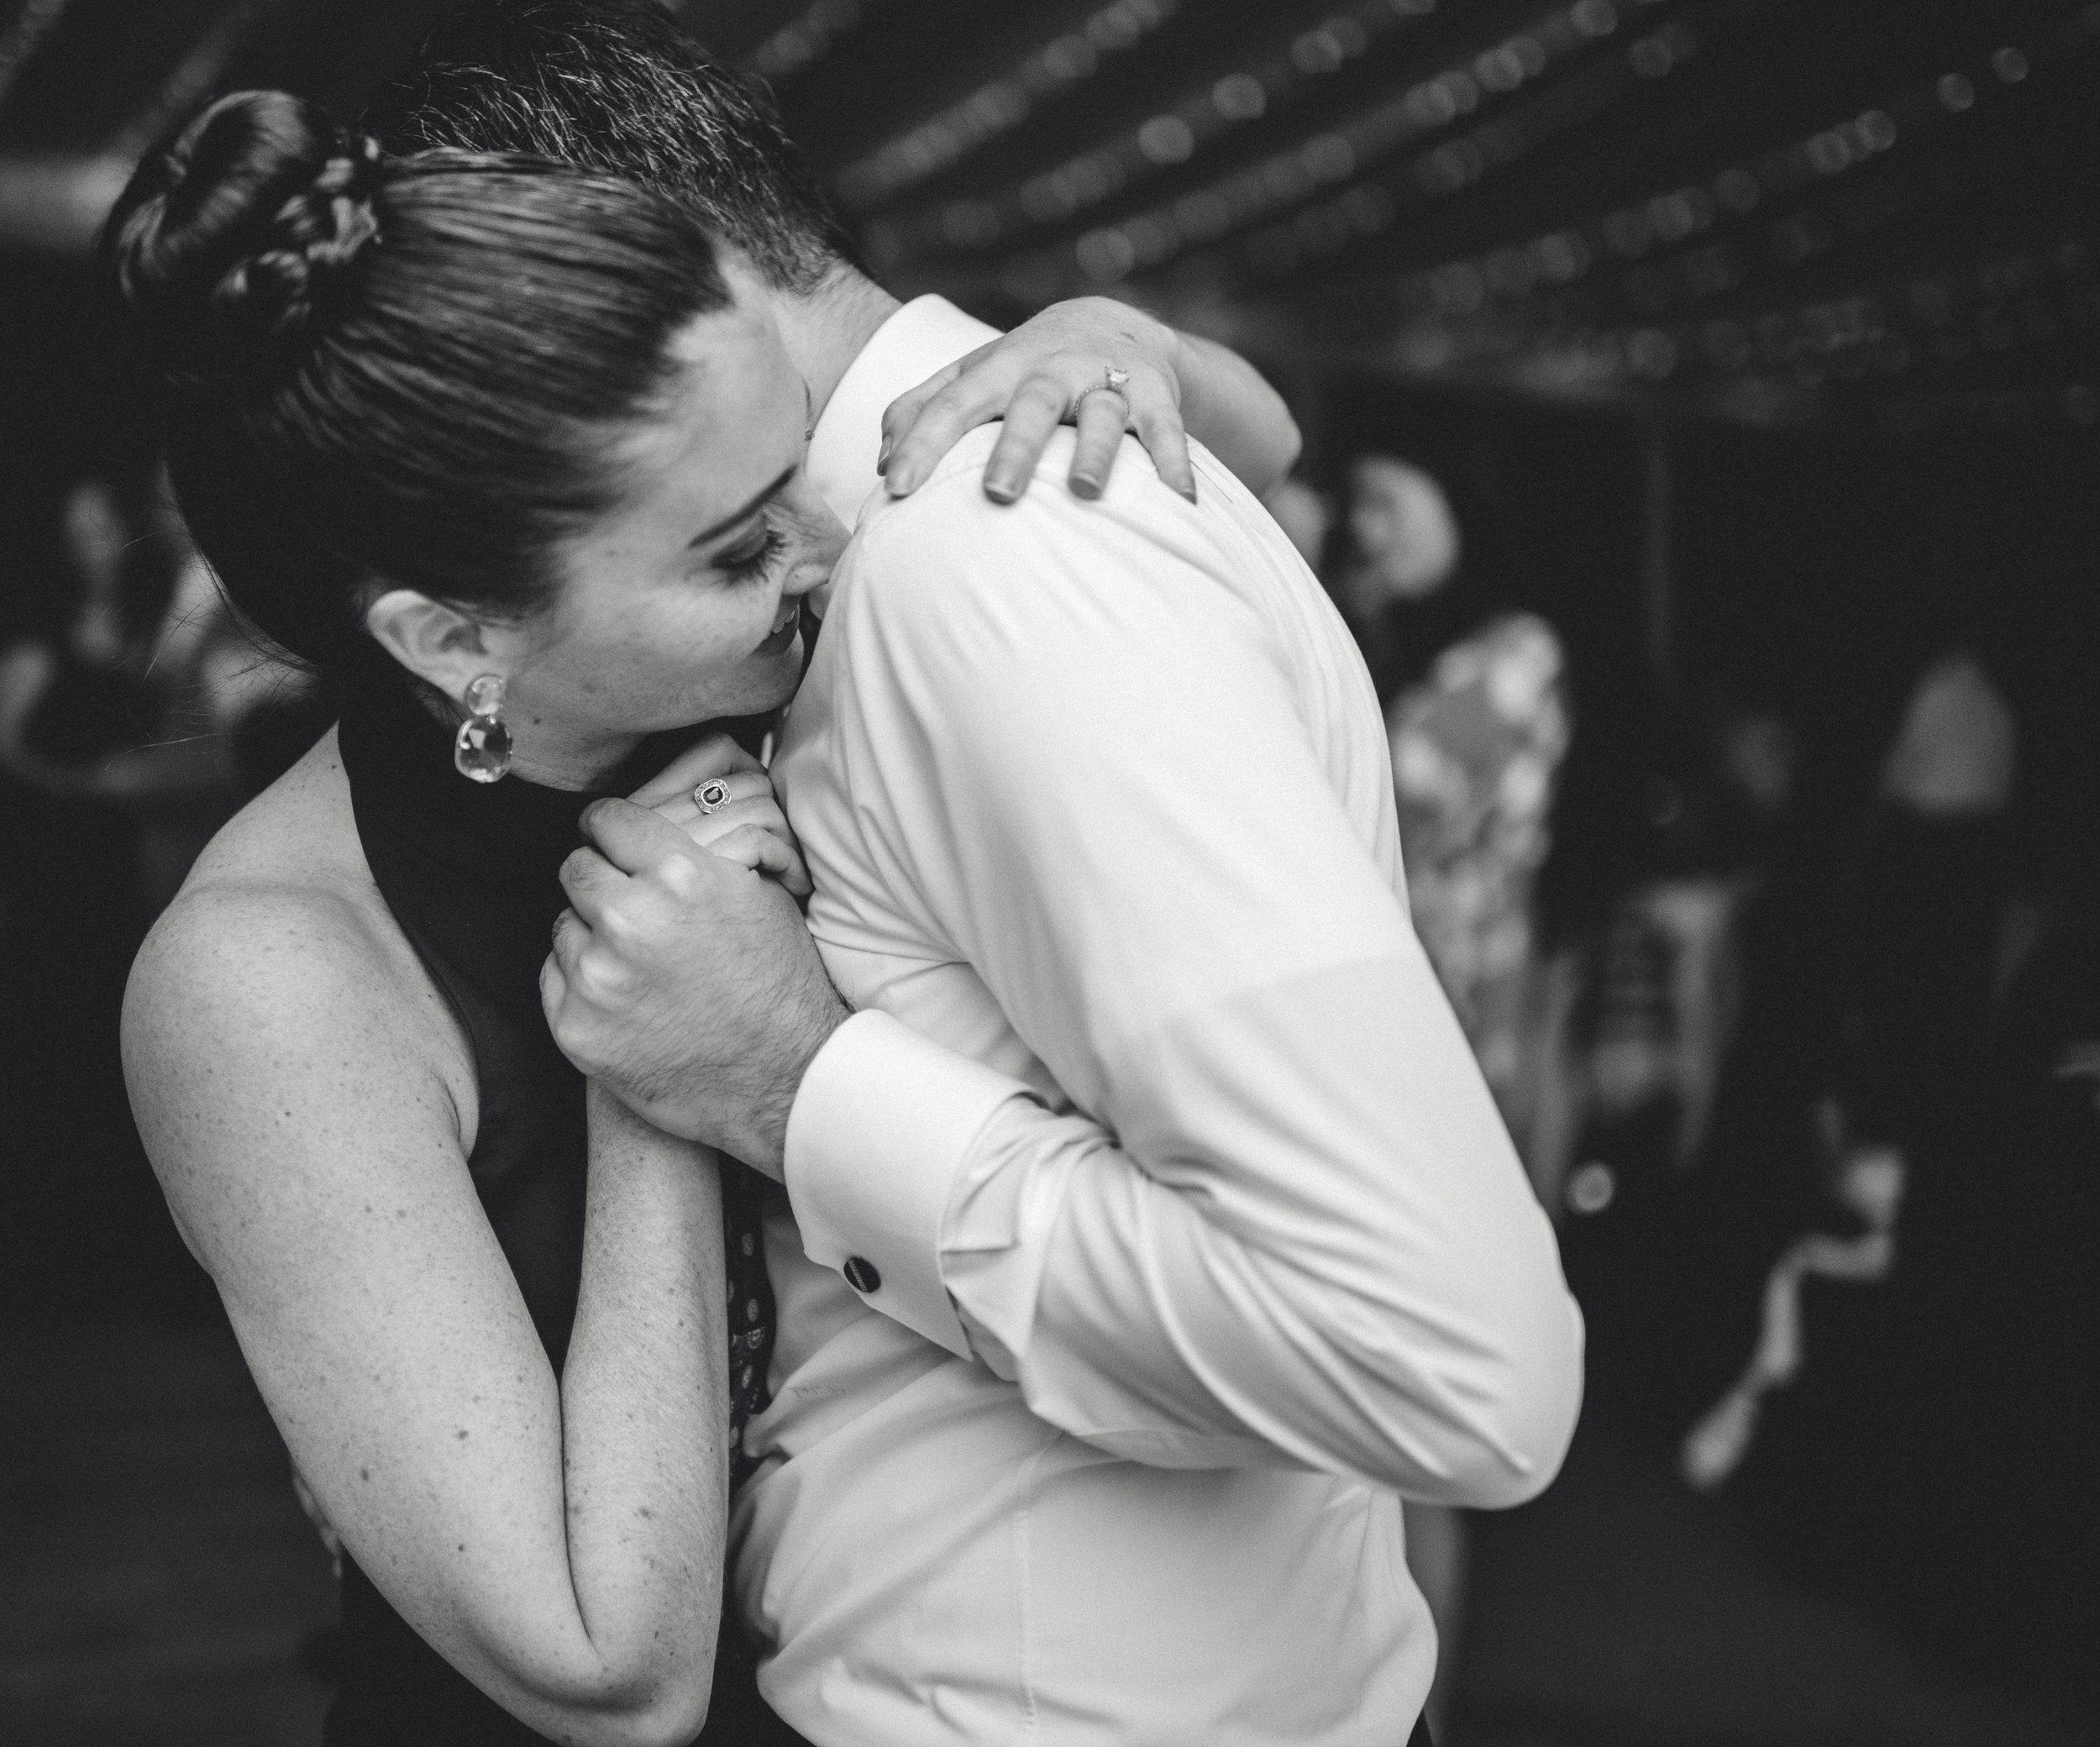 JACQUELINE & ANDREW WARSHAWER -BROOKMILL FARM FALL WEDDING - INTIMATE WEDDING PHOTOGRAPHER - TWOTWENTY by CHI-CHI AGBIM-739.jpg